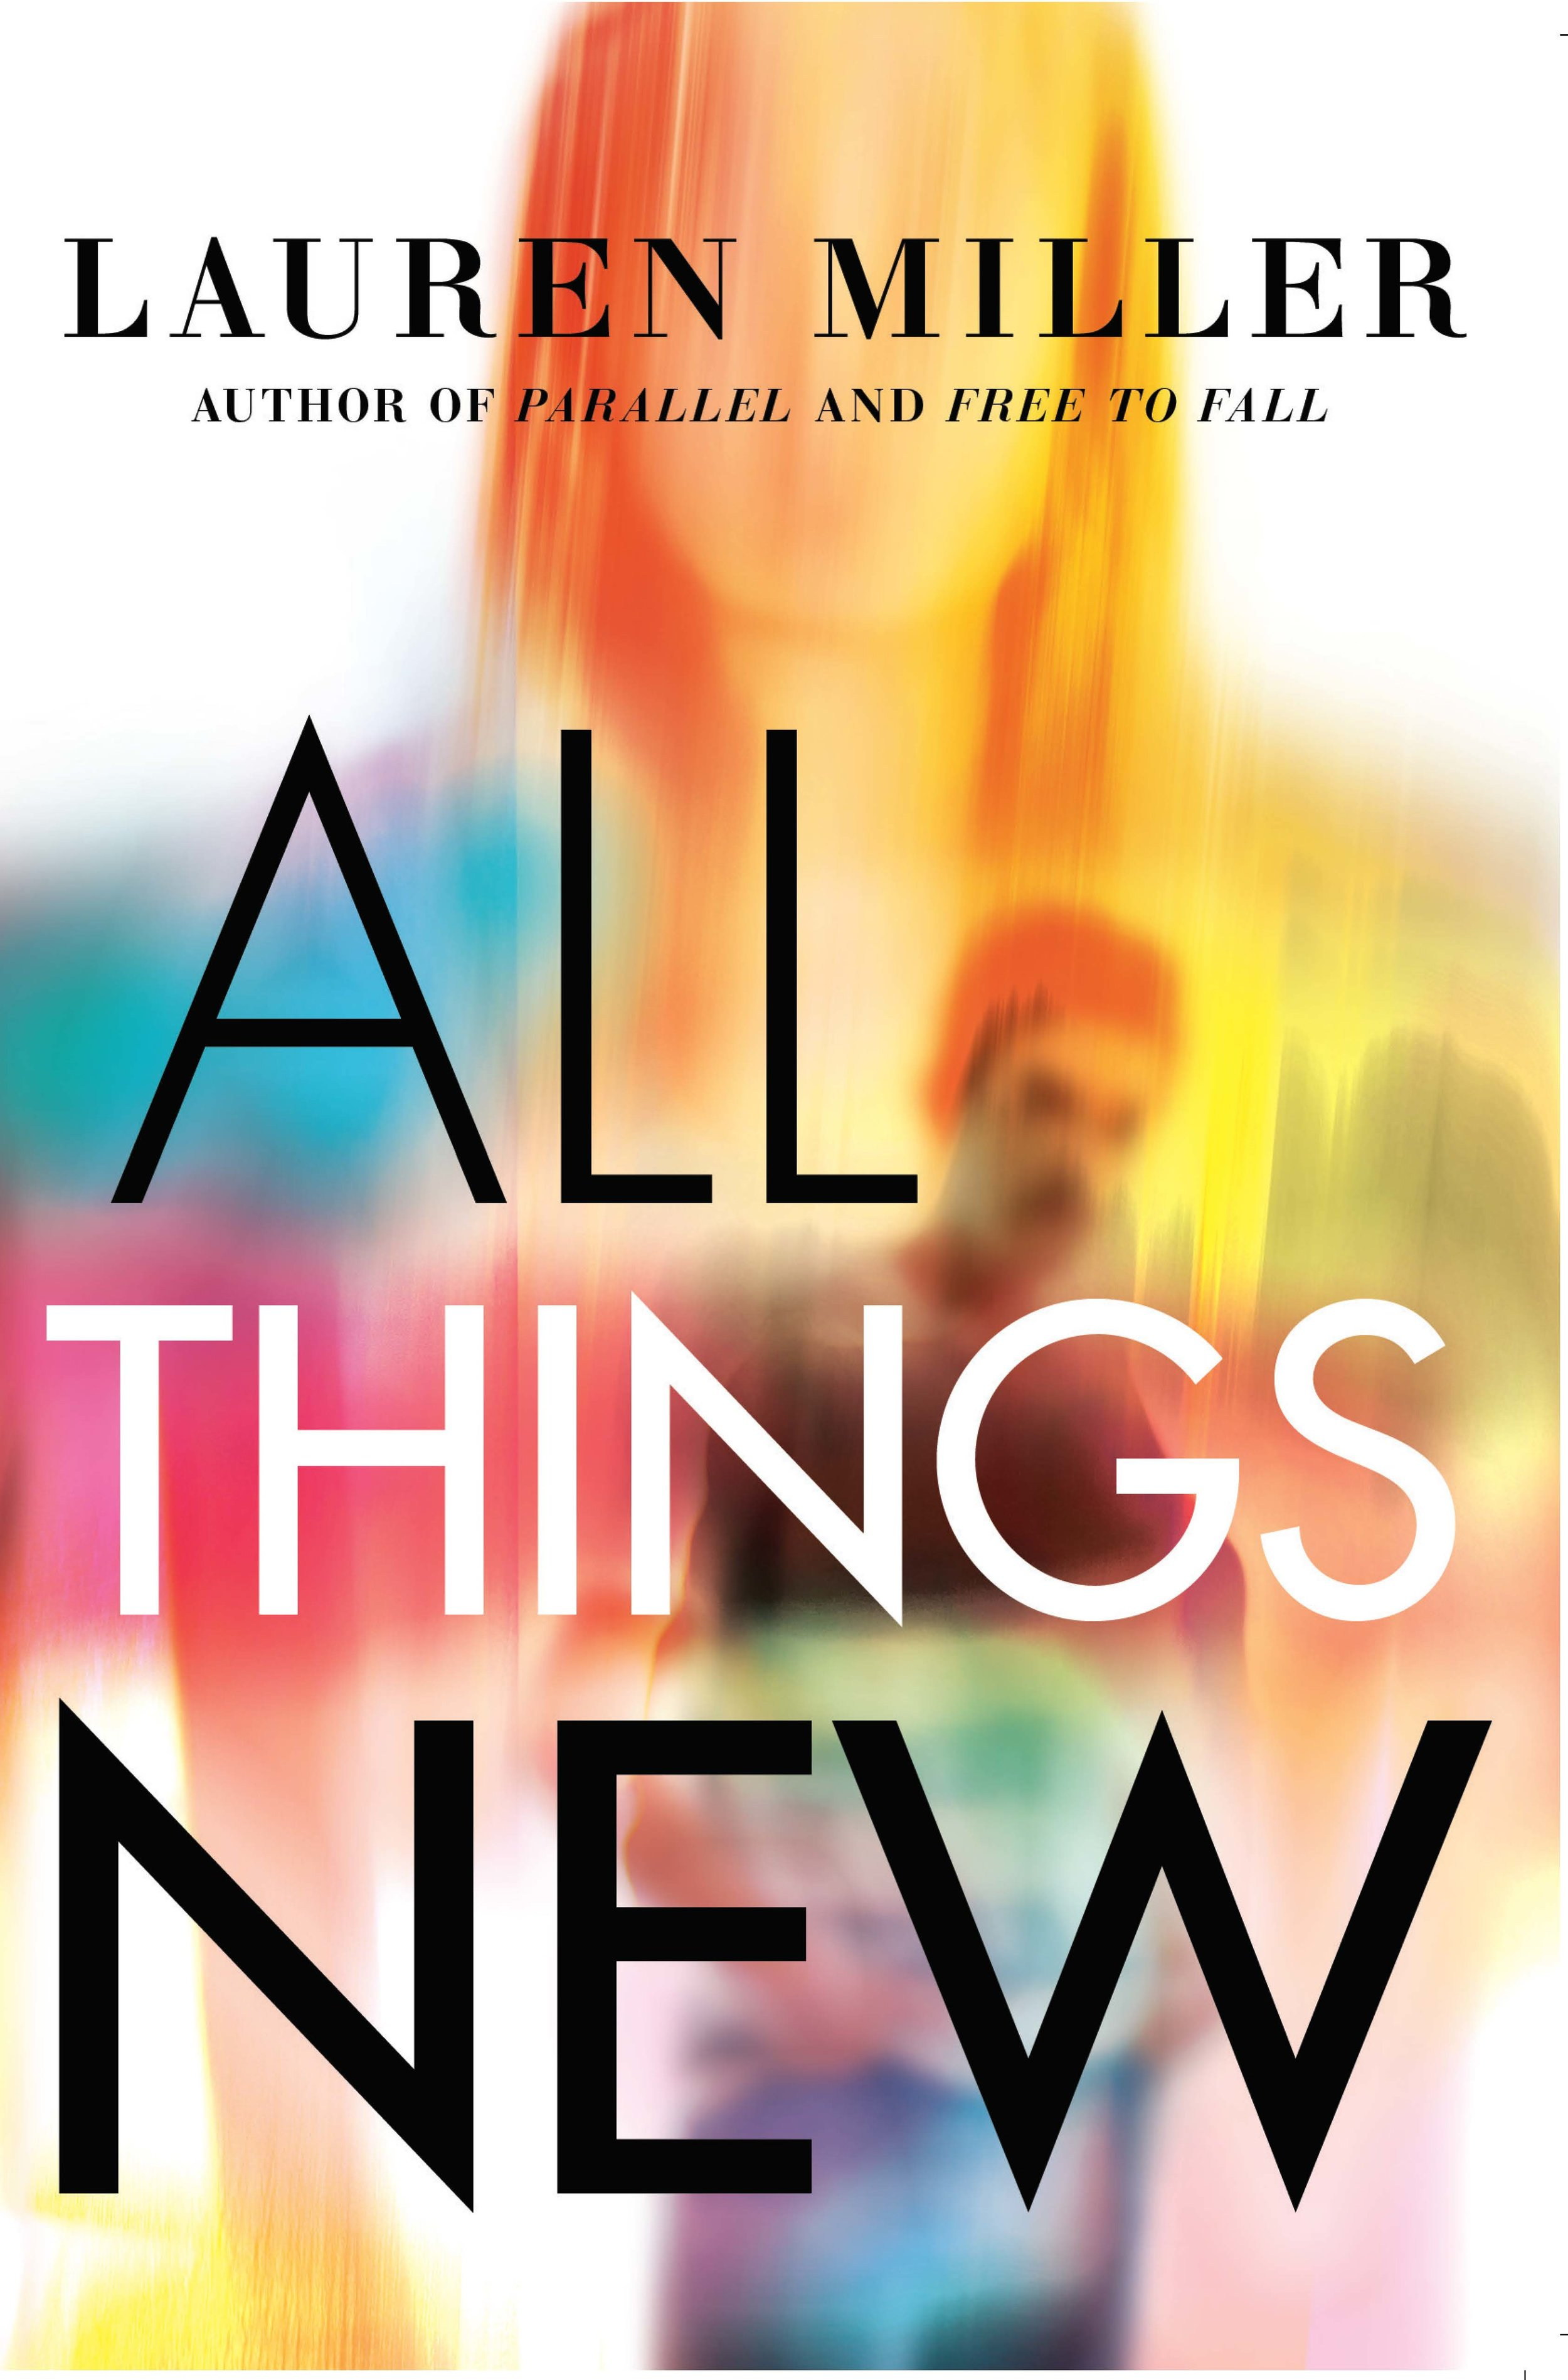 Lauren Miller Final cover paperback.jpg